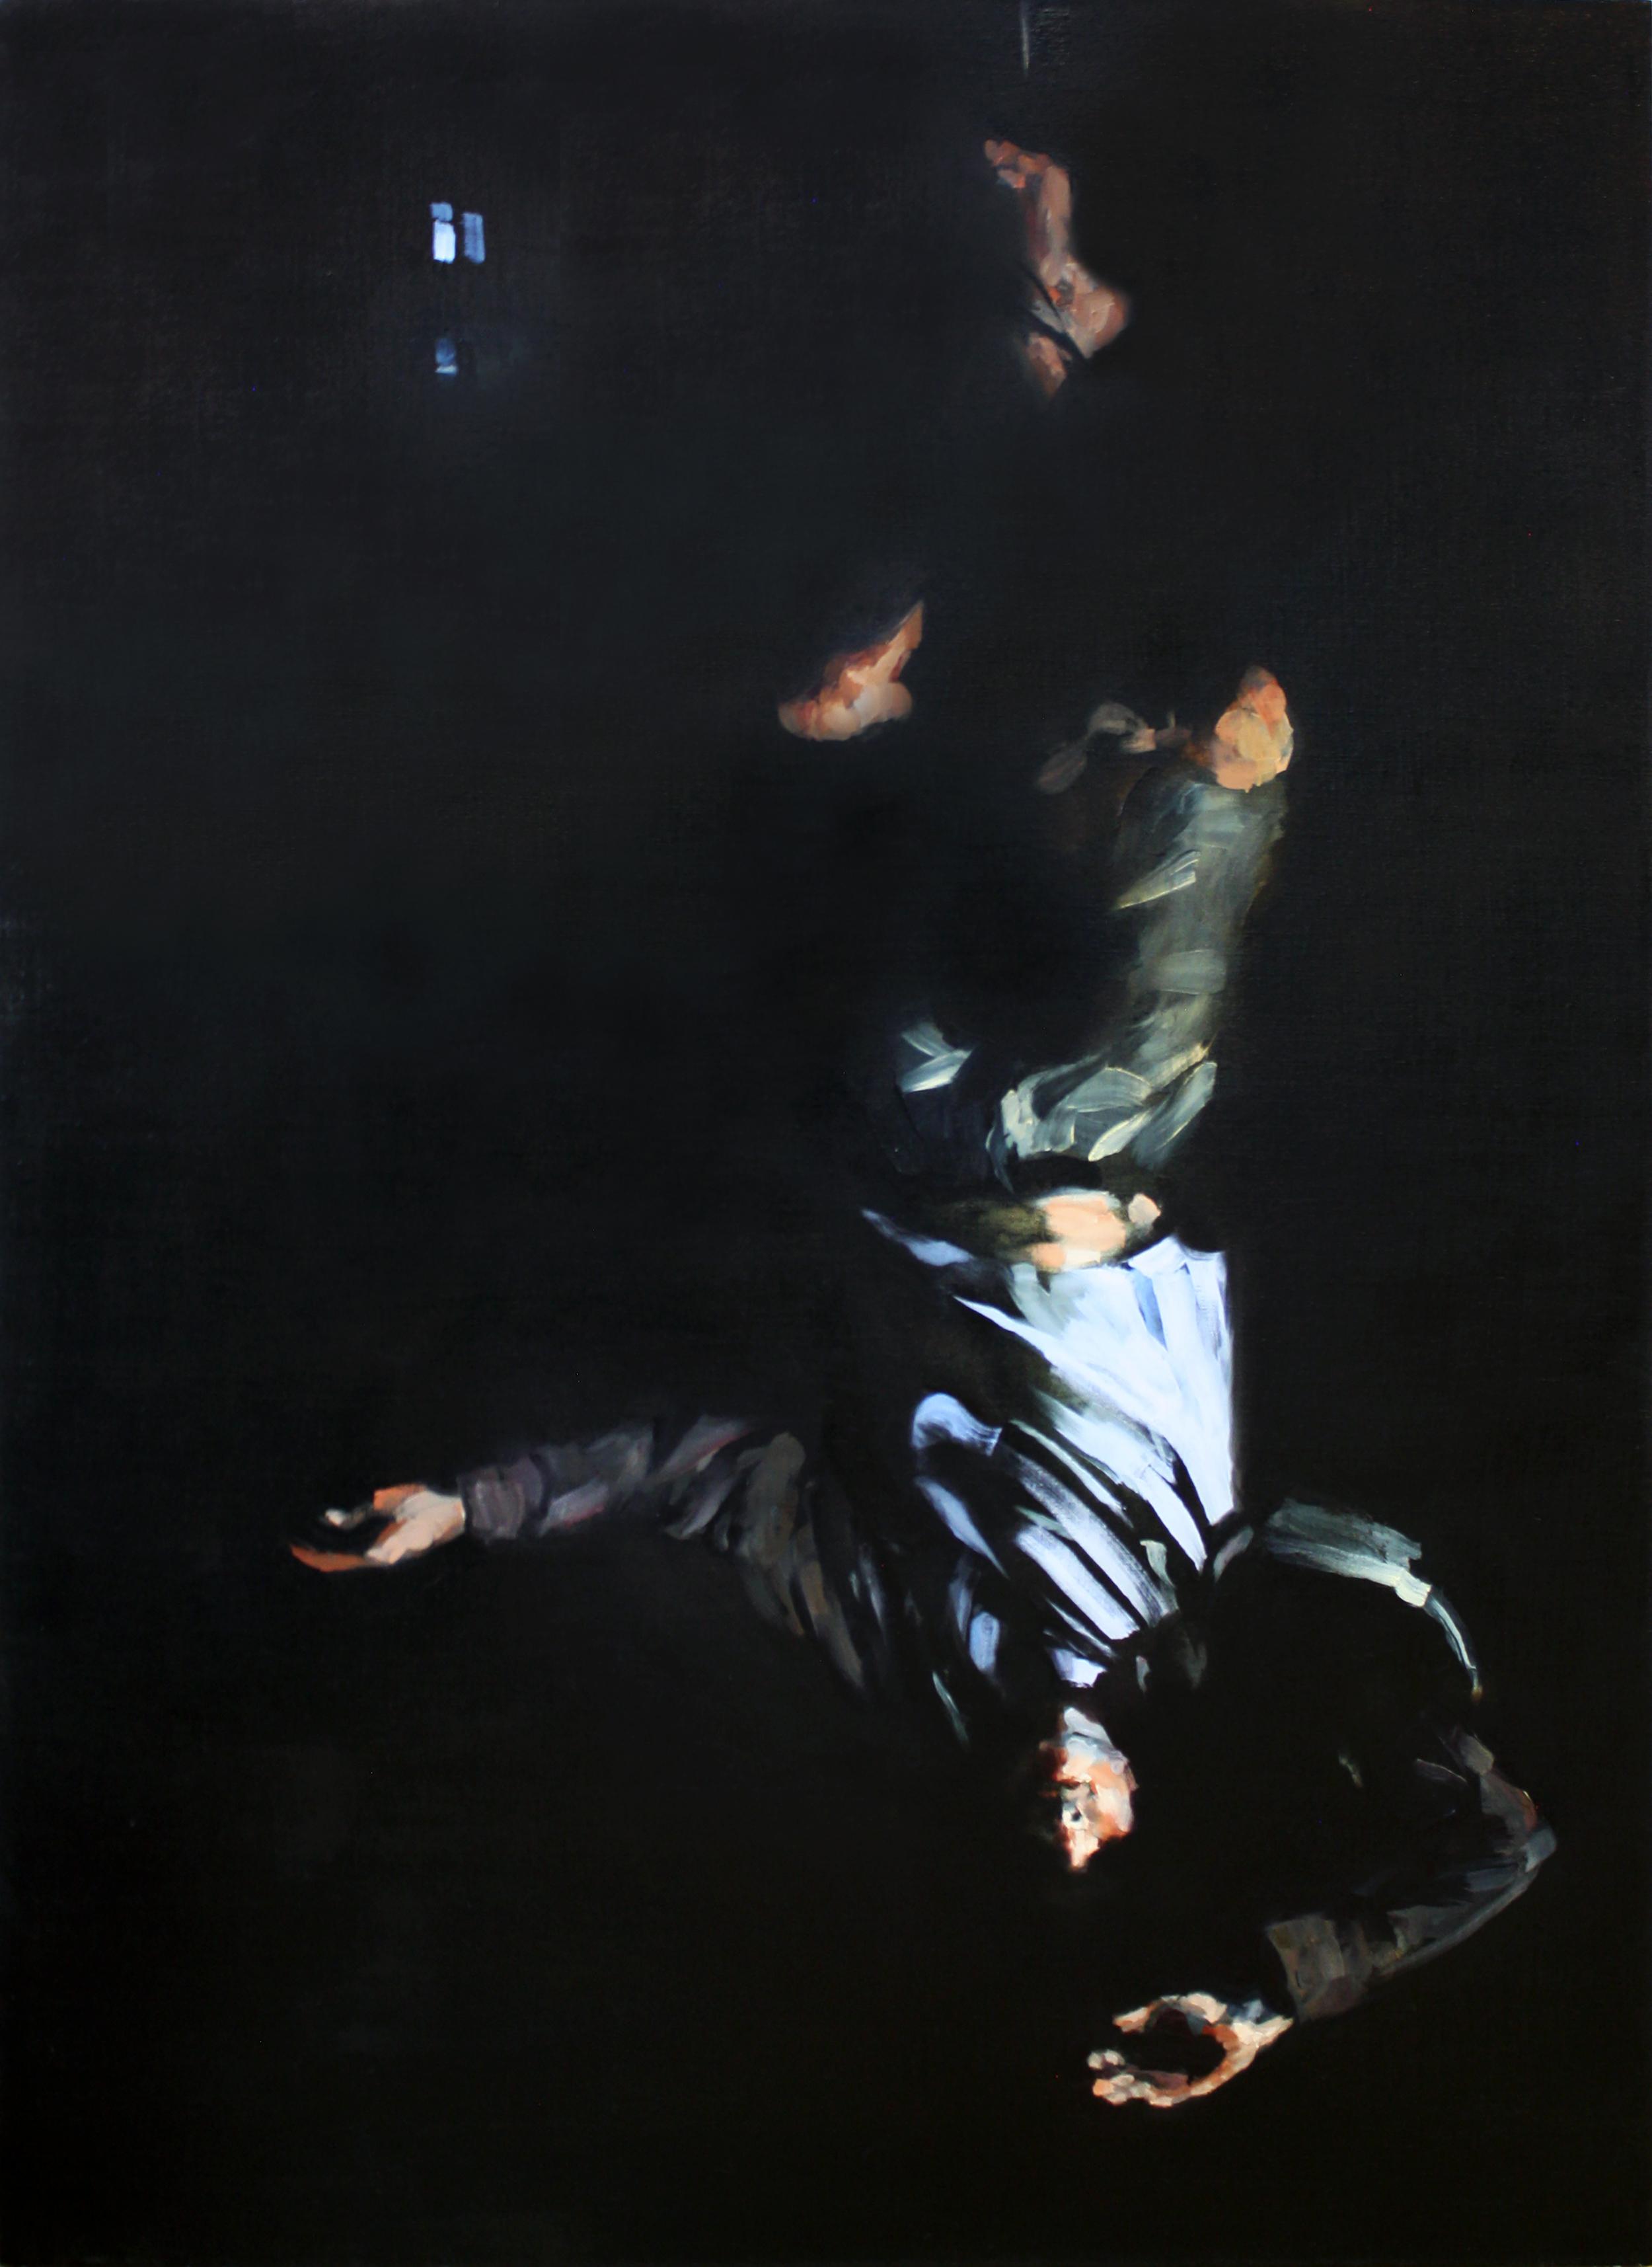 "Hanged Man, oil on linen, 59"" x 43"" x 4"", 2016 (sold)"